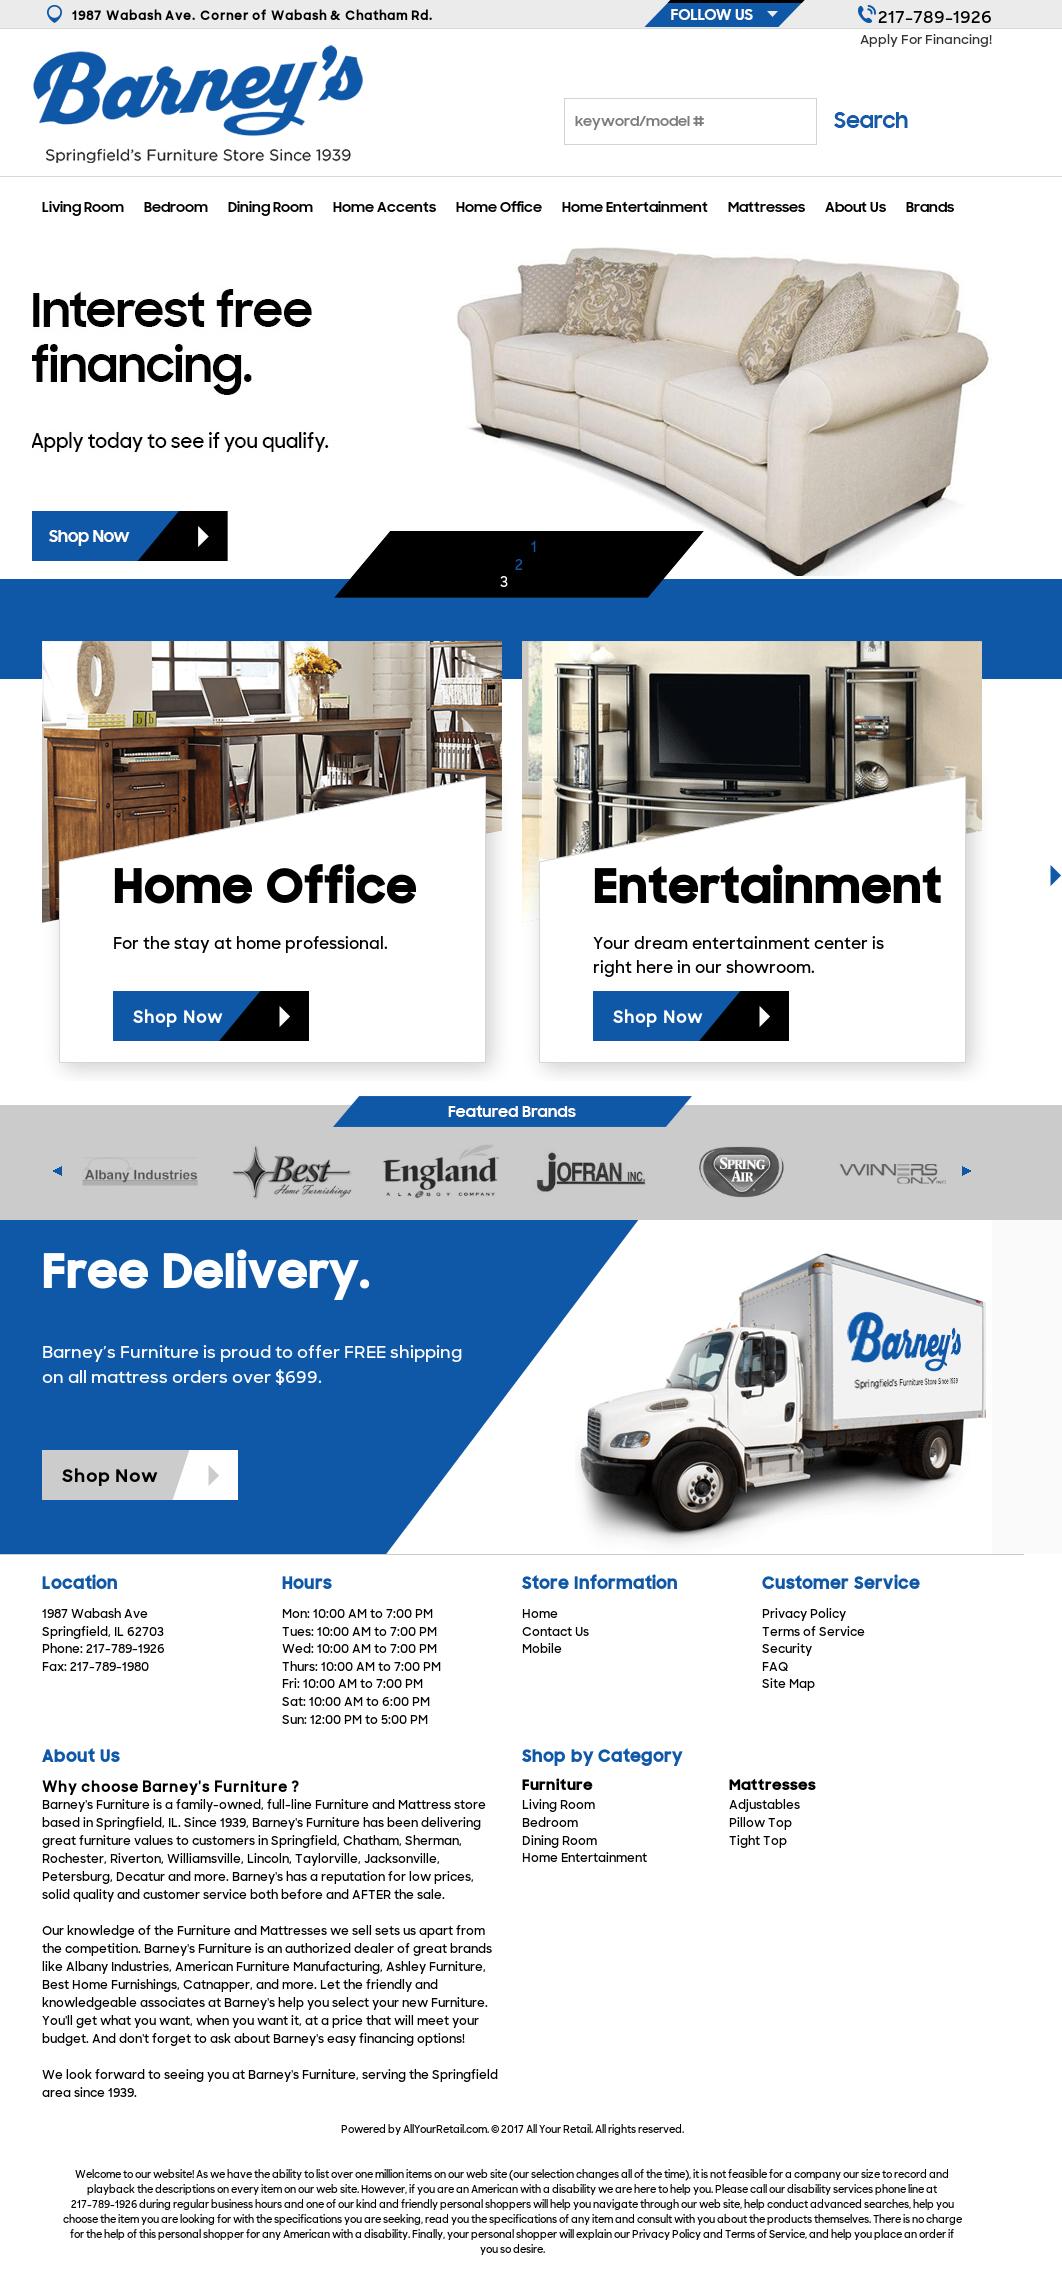 Barneyu0027s Furniture Website History